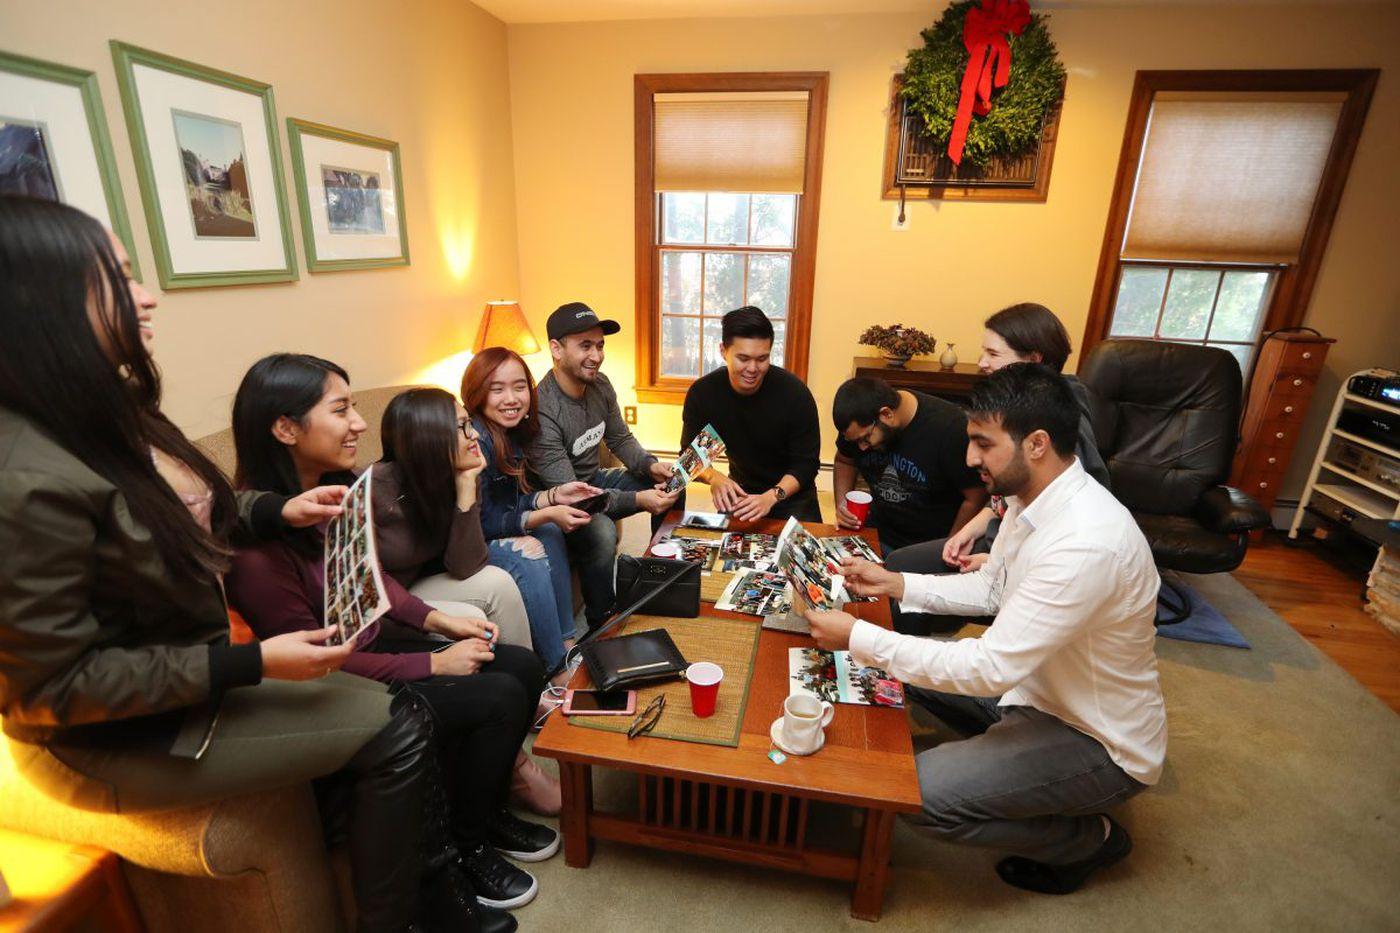 An ESL Thanksgiving: At South Jersey bash, newcomers to U.S. talk turkey | Kevin Riordan